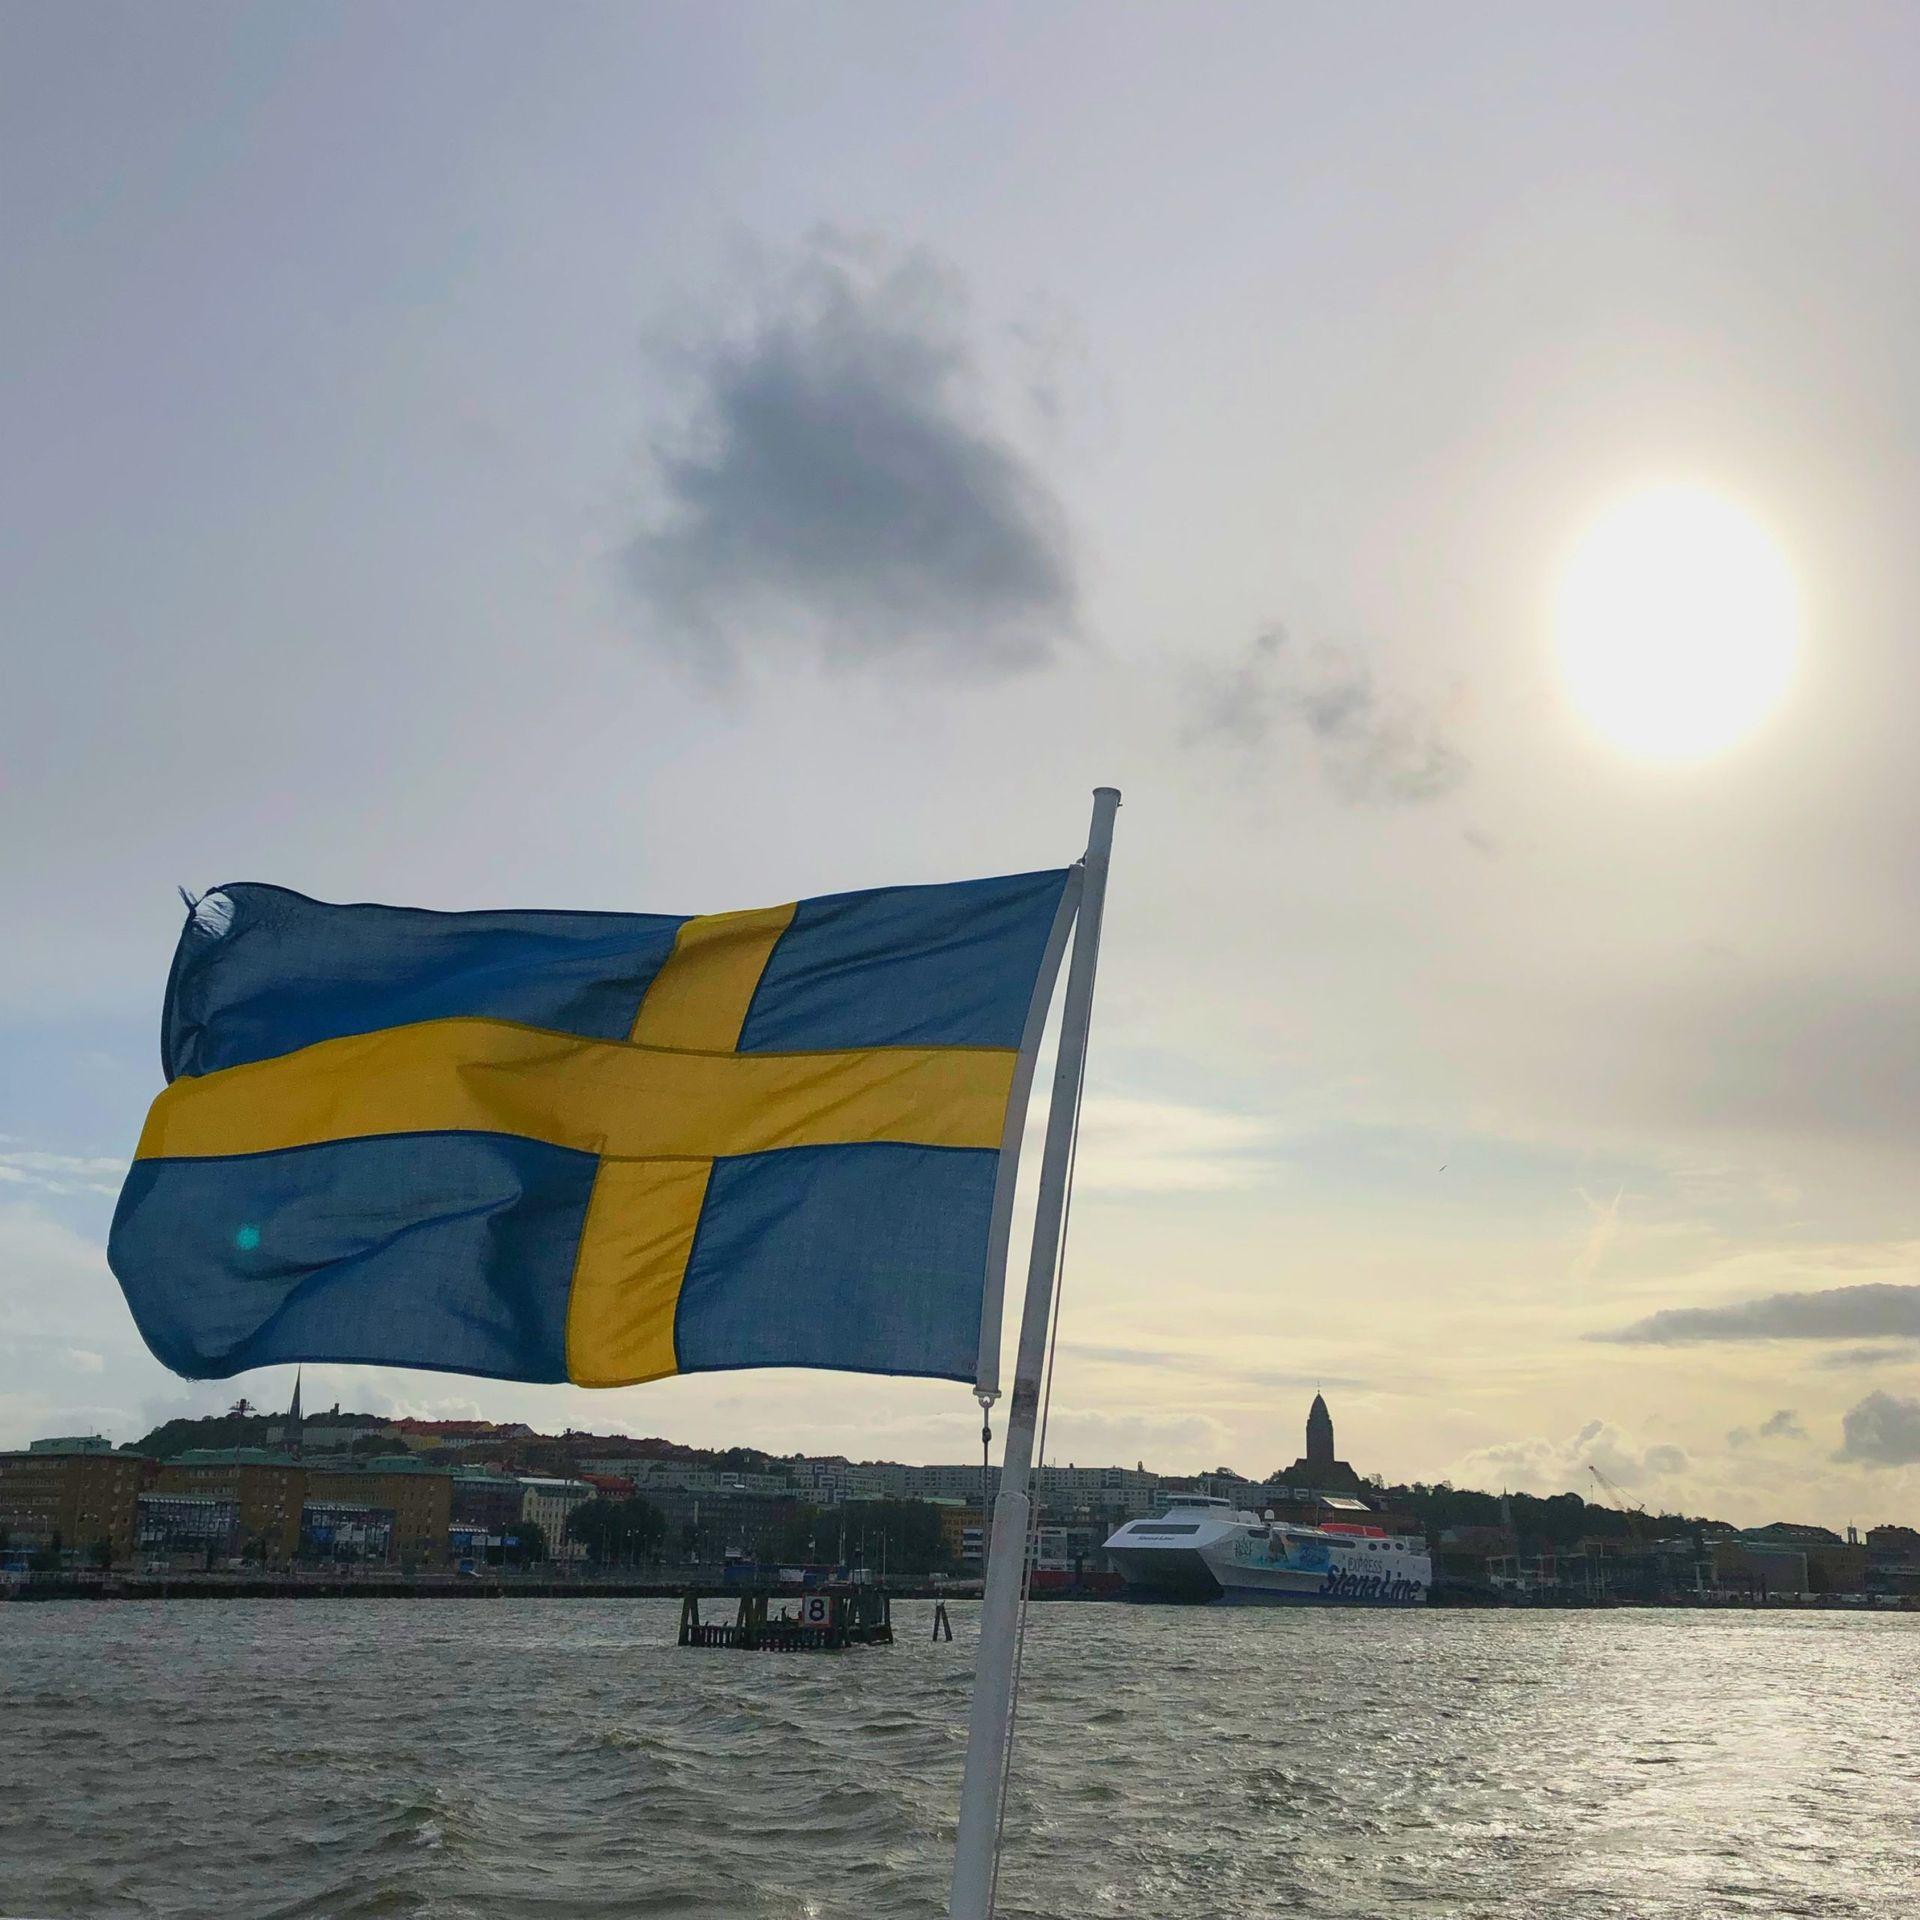 A Swedish flag on a boat.